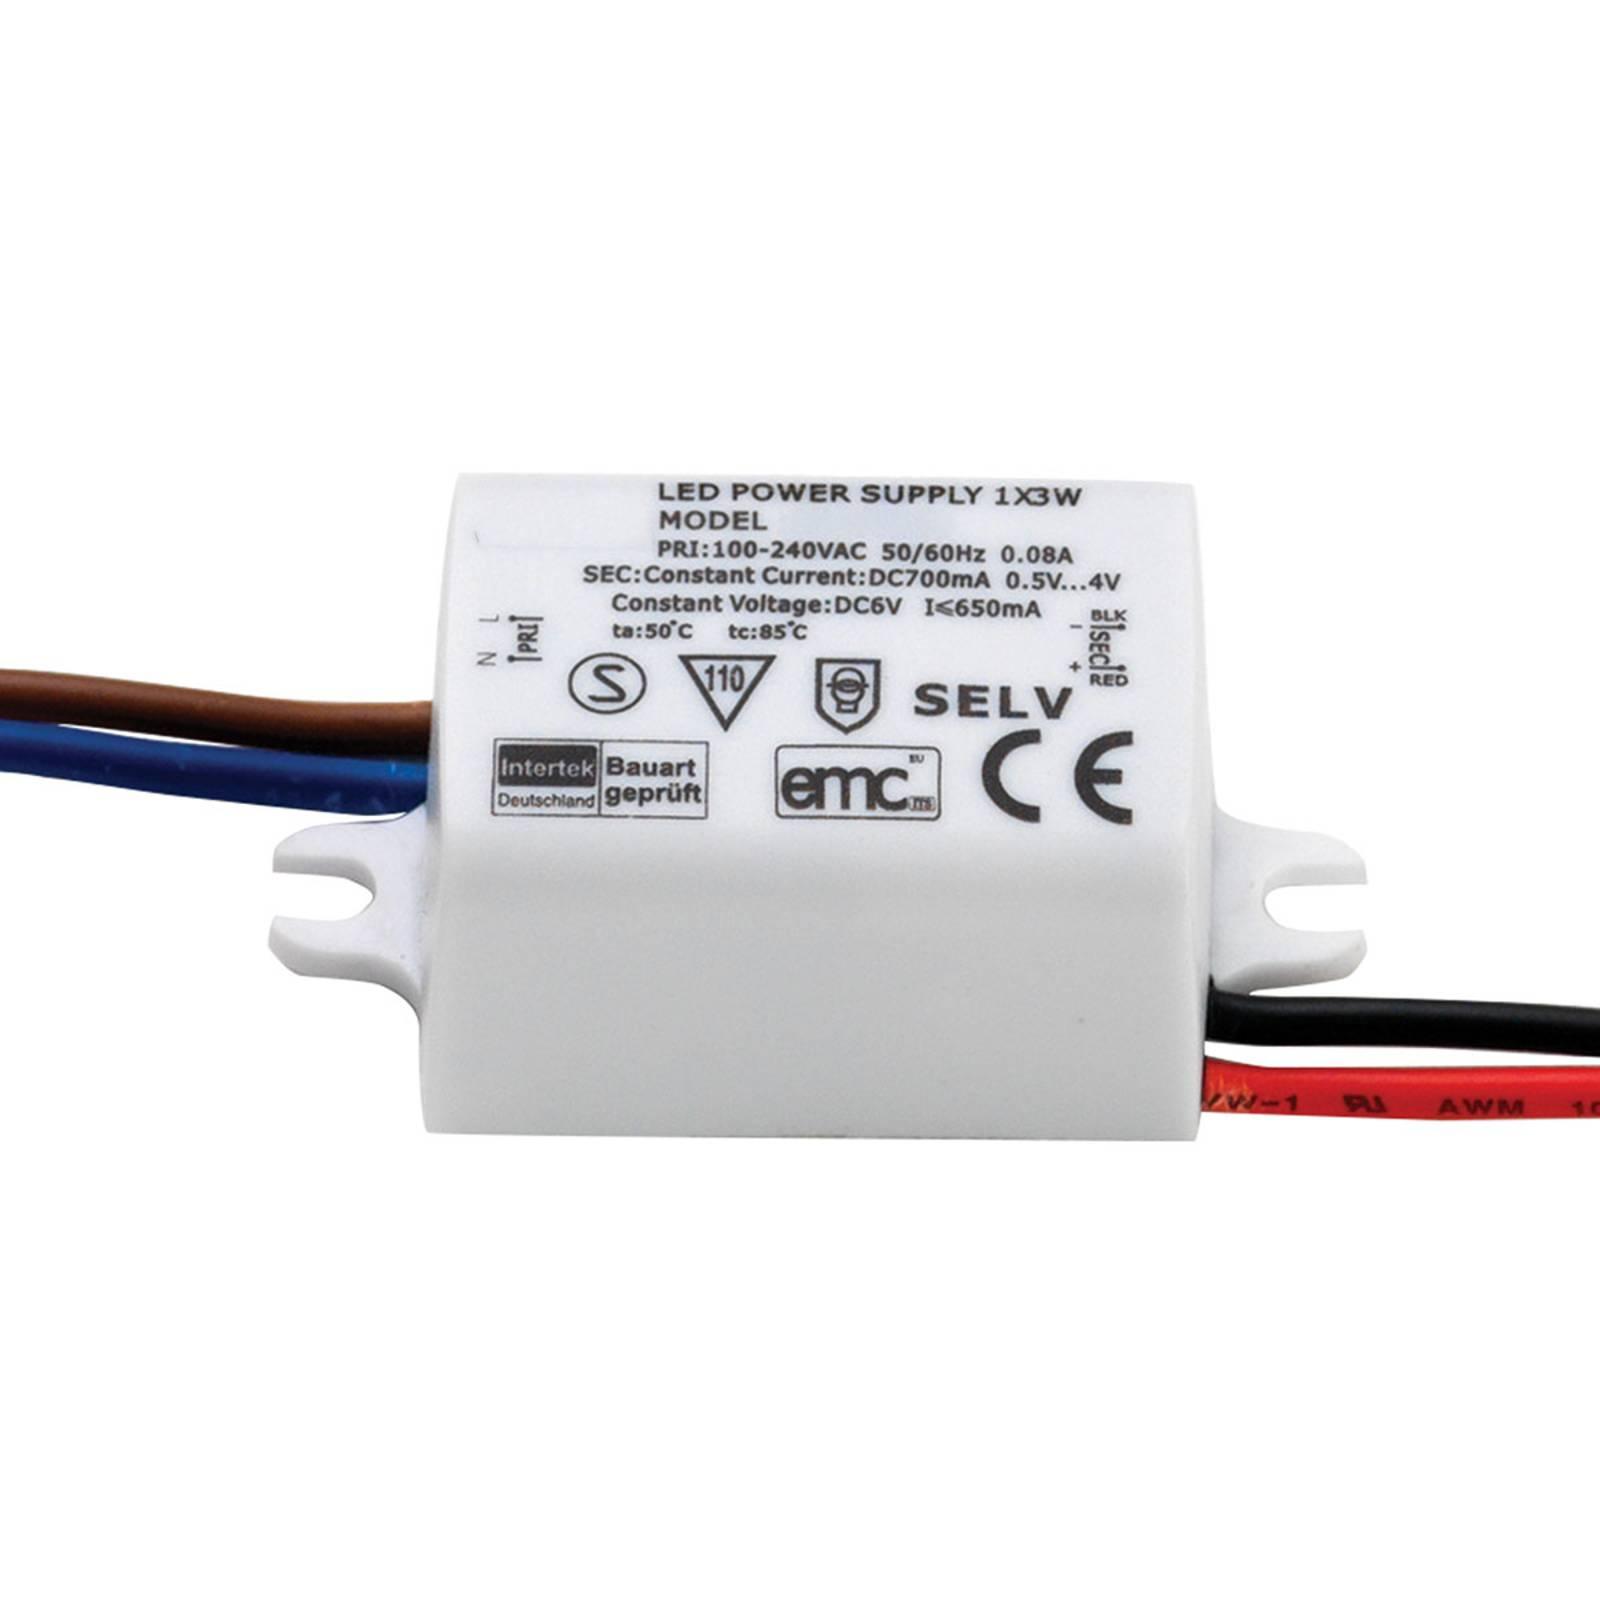 Astro-LED-muuntaja 2–4,55 W 700 mA